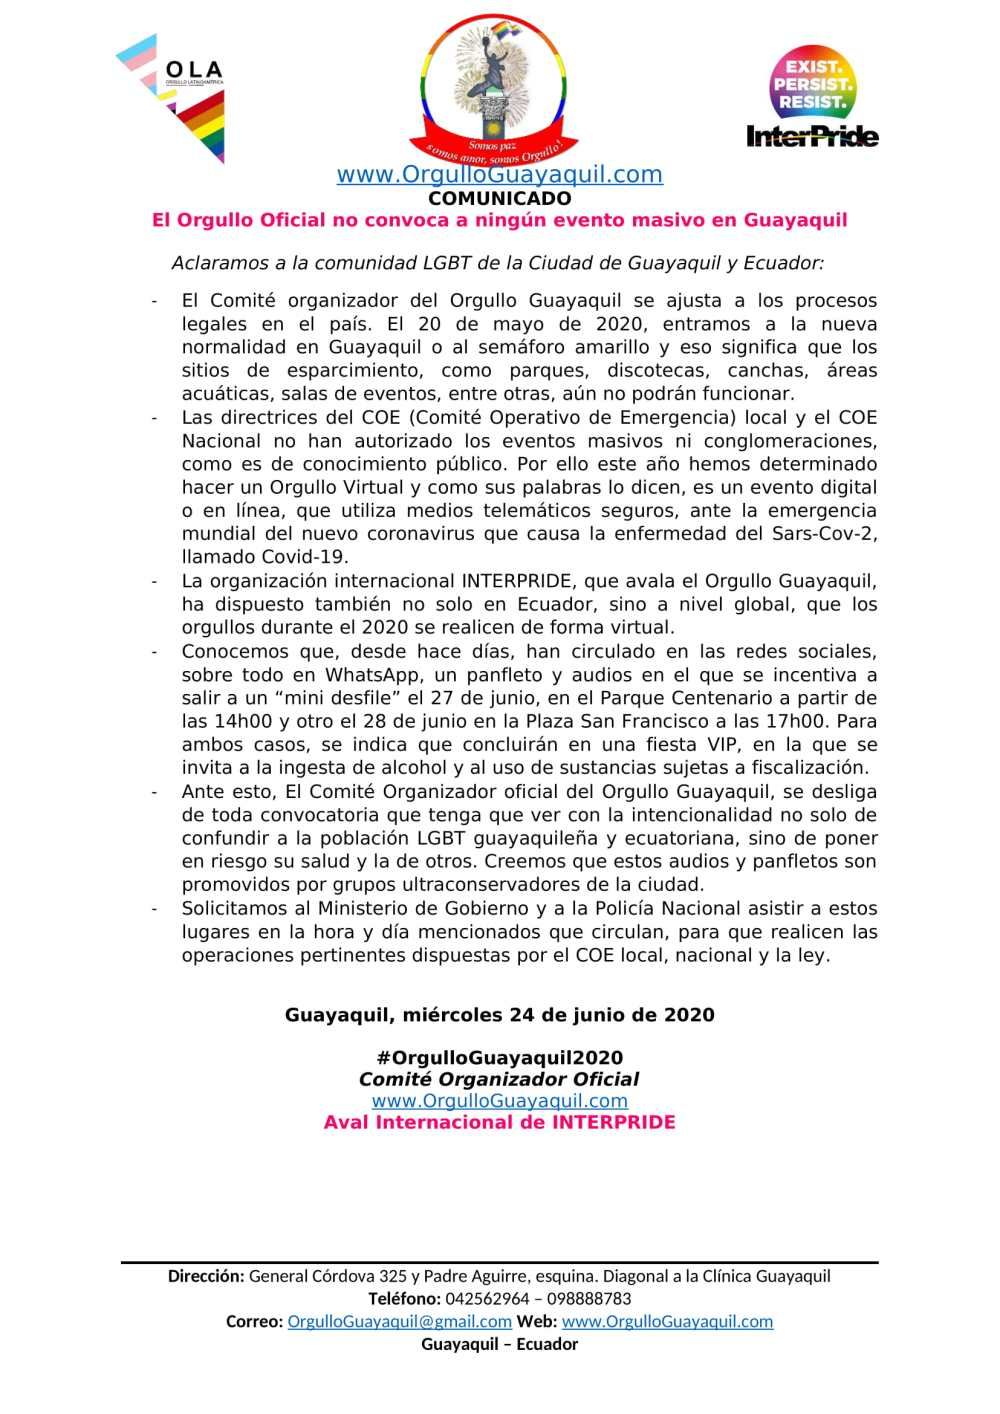 Comunicado - El Orgullo Oficial no convoca a ningún evento masivo en Guayaquil - Orgullo Guayaquil-1